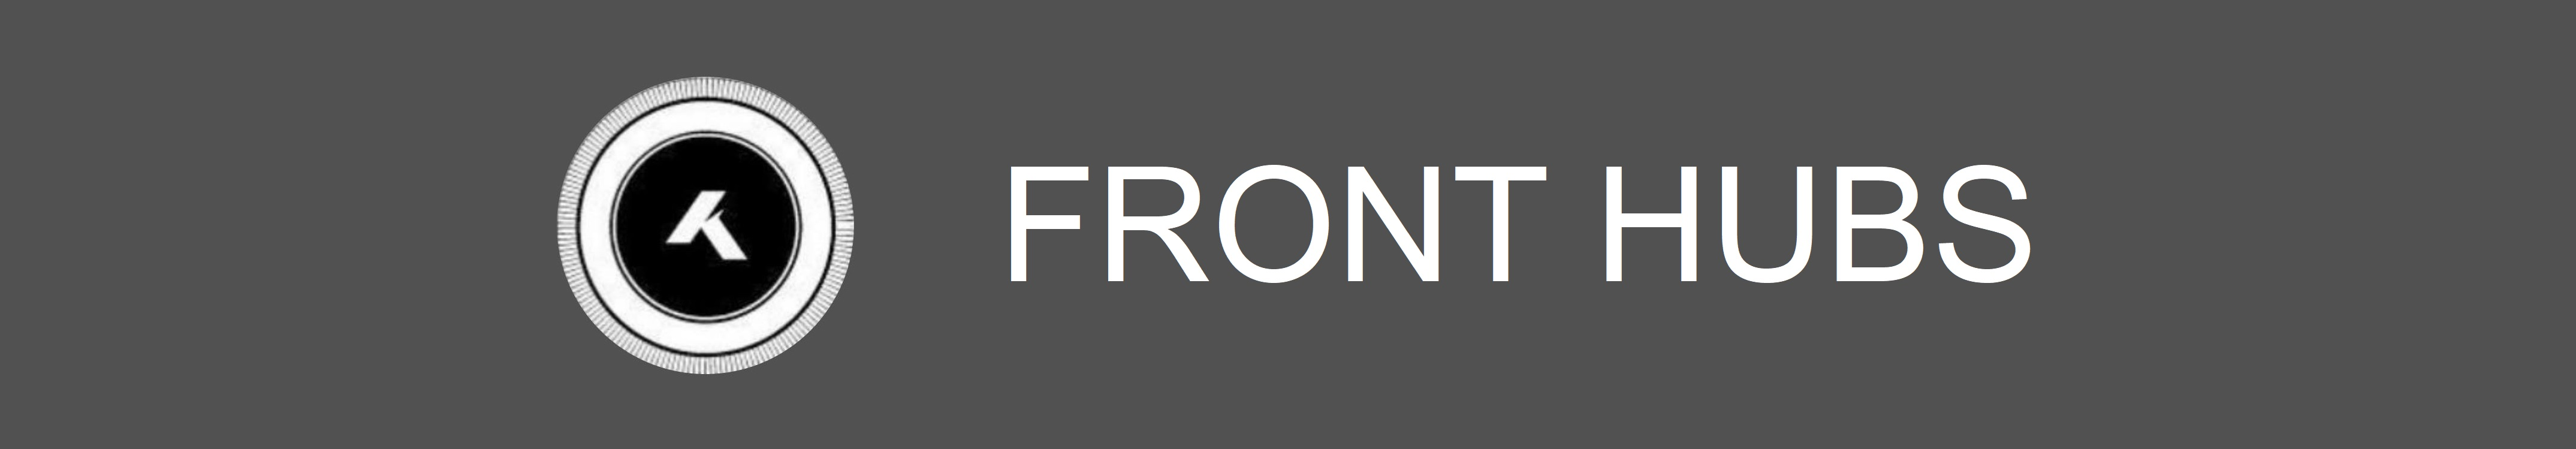 Front-Hubs